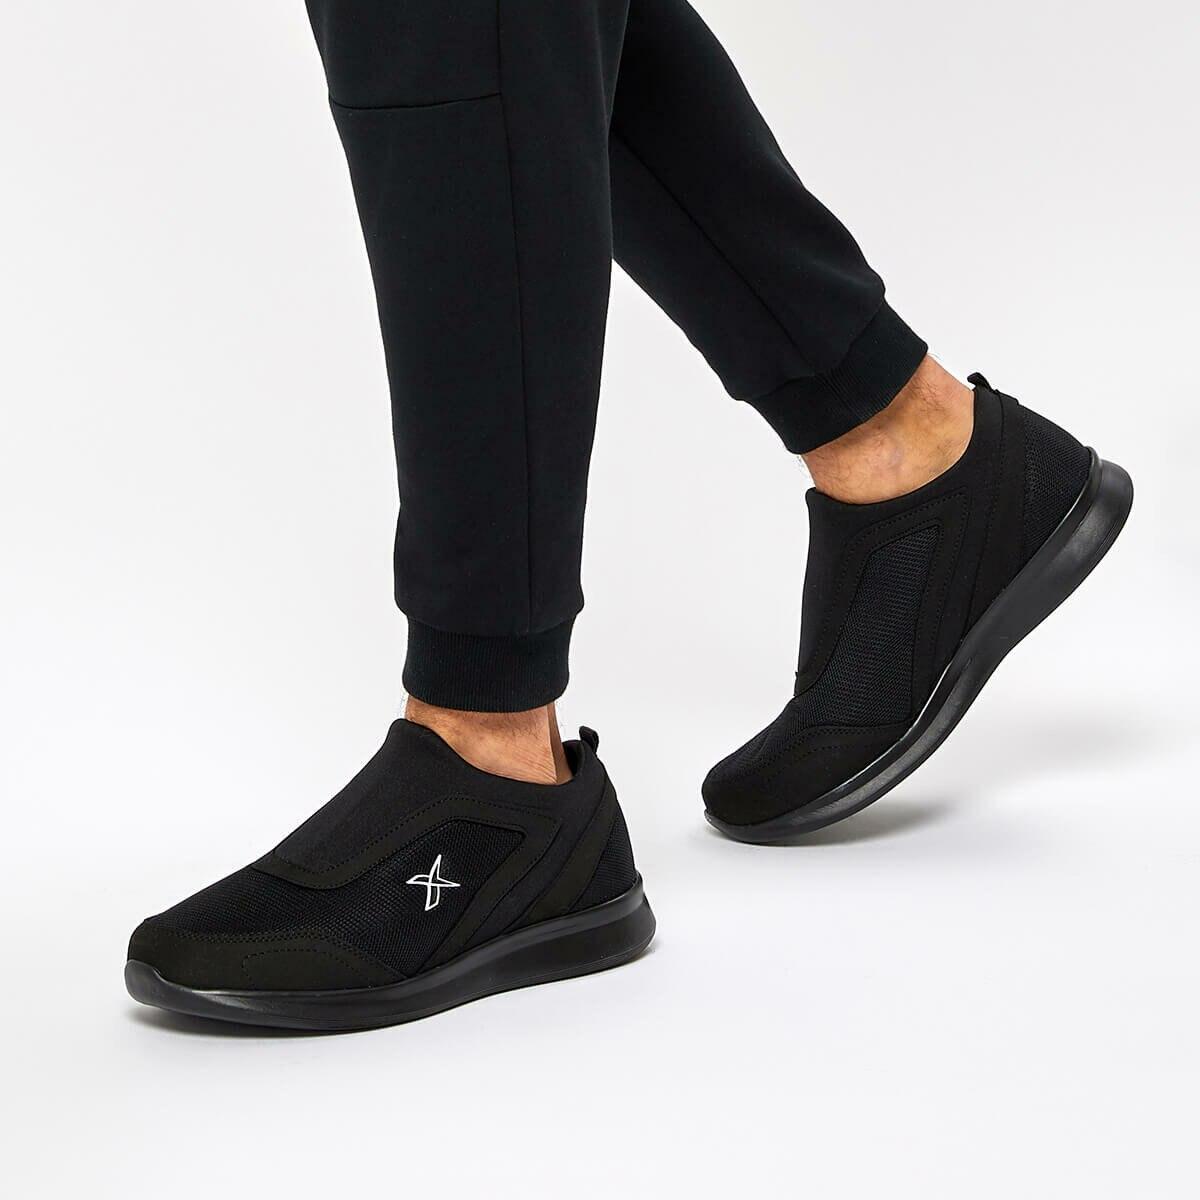 FLO RODY Black Men 'S Comfort Shoes KINETIX